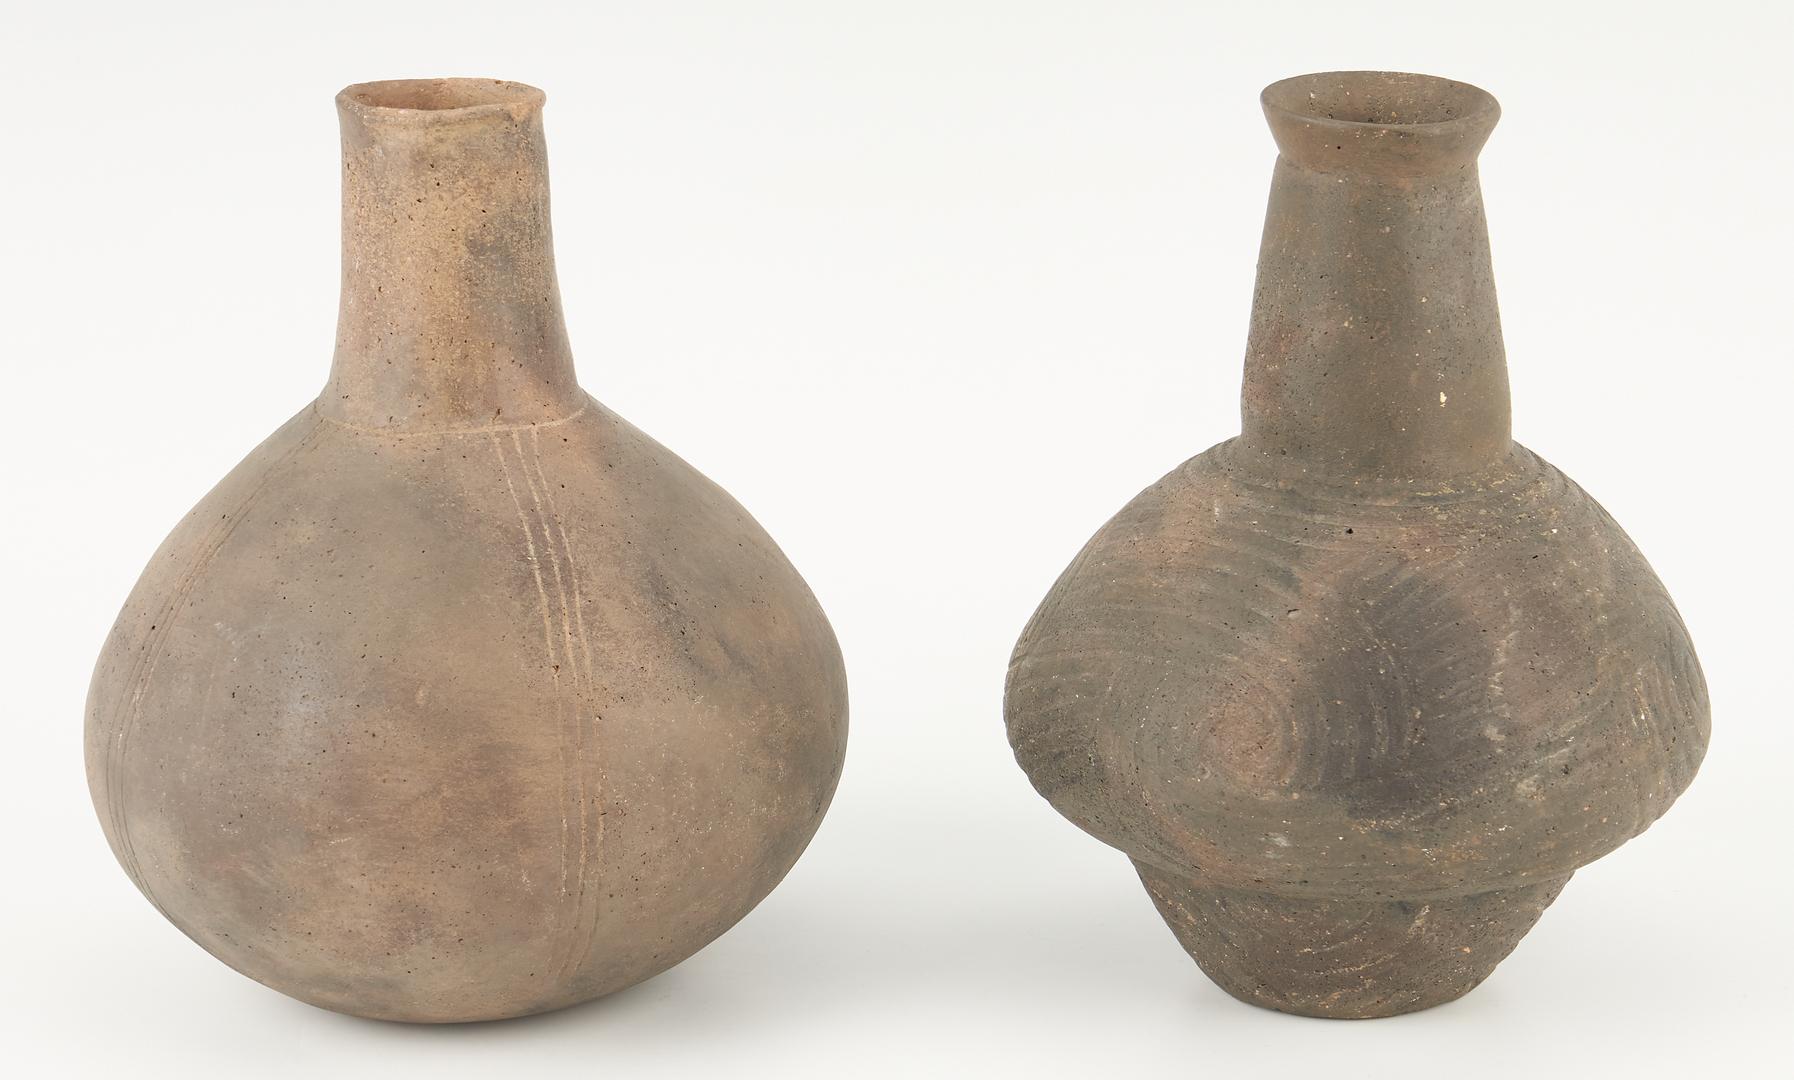 Lot 1110: 2 Mississippian Culture Caddo Water Bottles